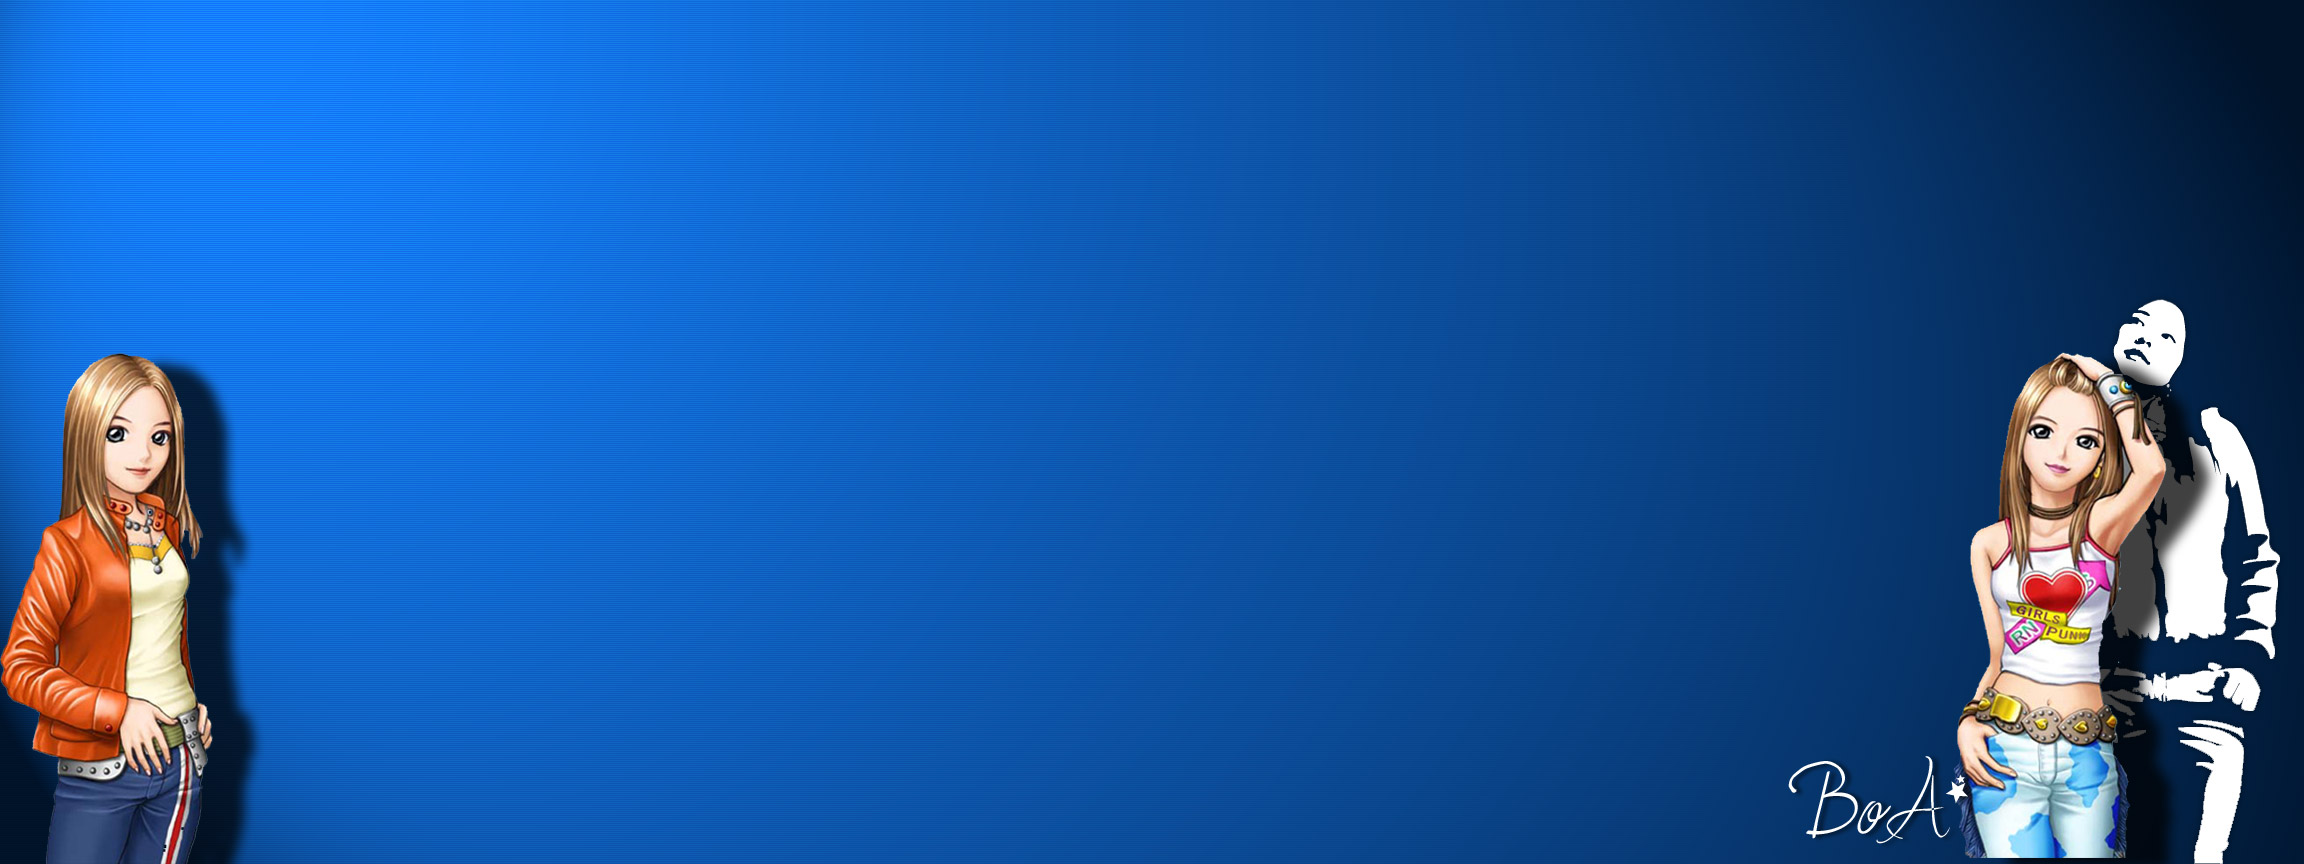 Blue Anime Aesthetic Baddie Anime Wallpaper Hd Bokeh glitter blue sky photo background 1379 with images. blue anime aesthetic baddie anime